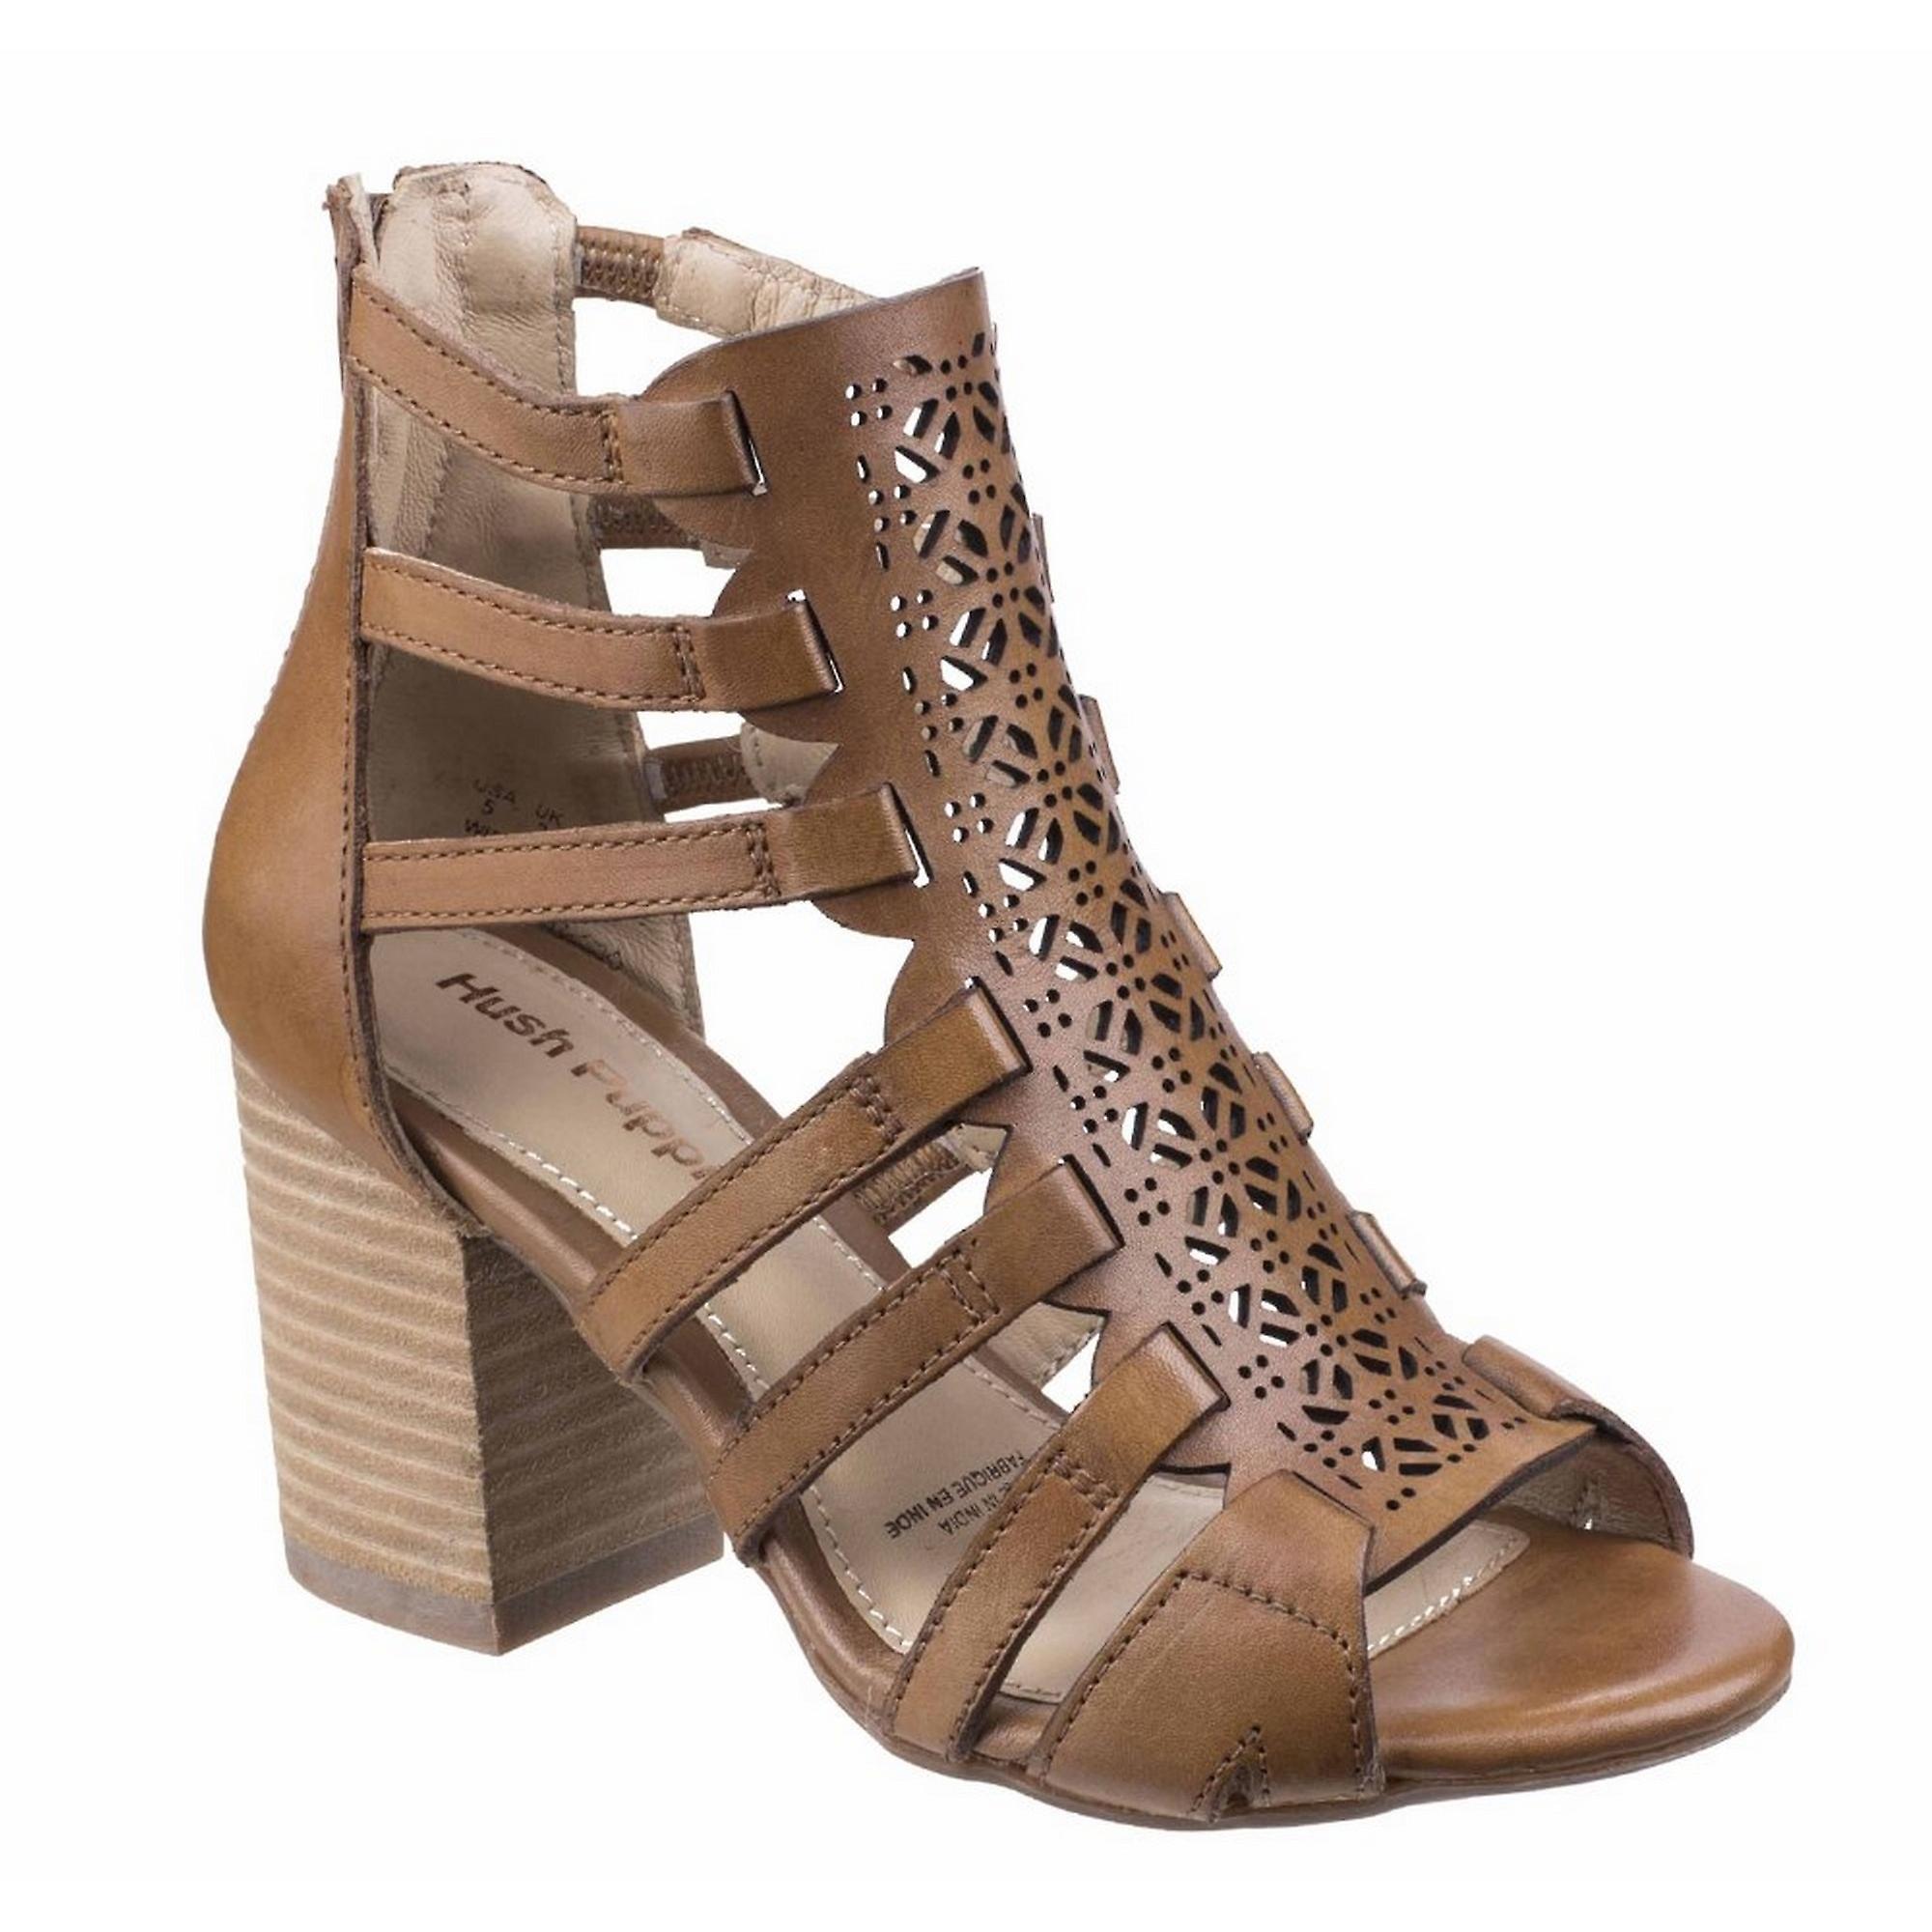 Hush Puppies Womens/dames Malia Baja Leather Sandals